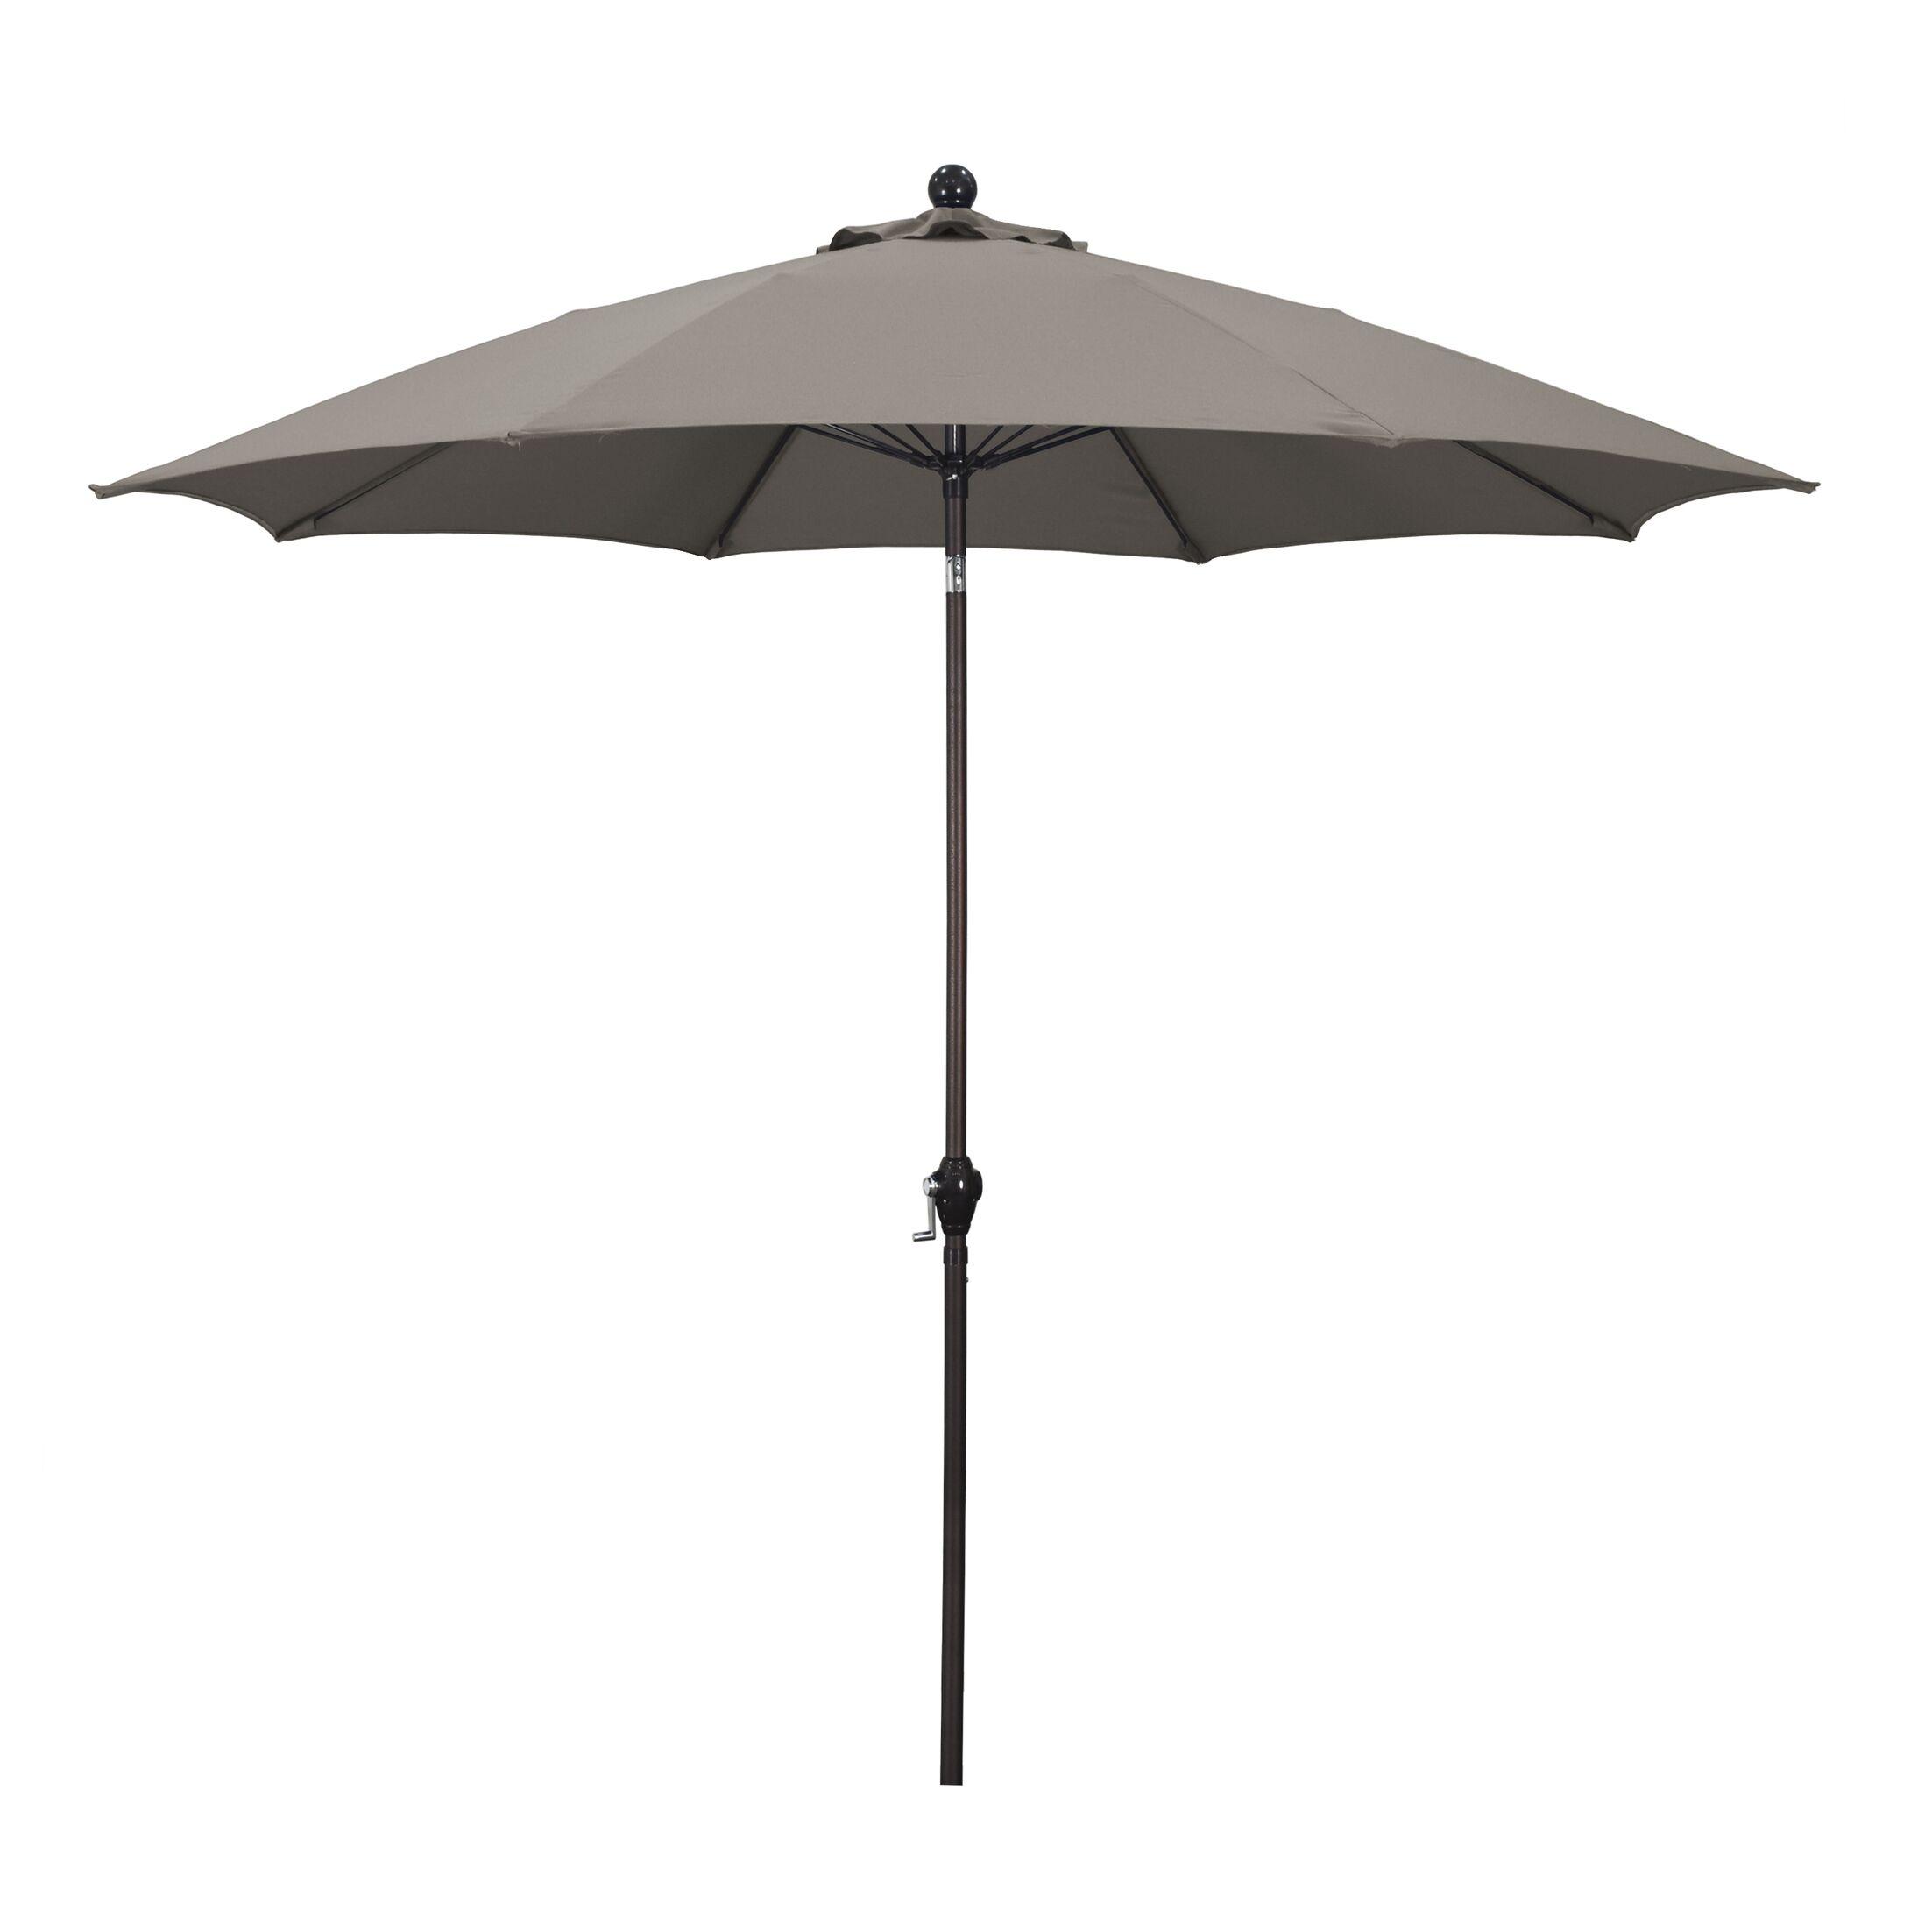 9' Market Umbrella Fabric: Polyester Taupe